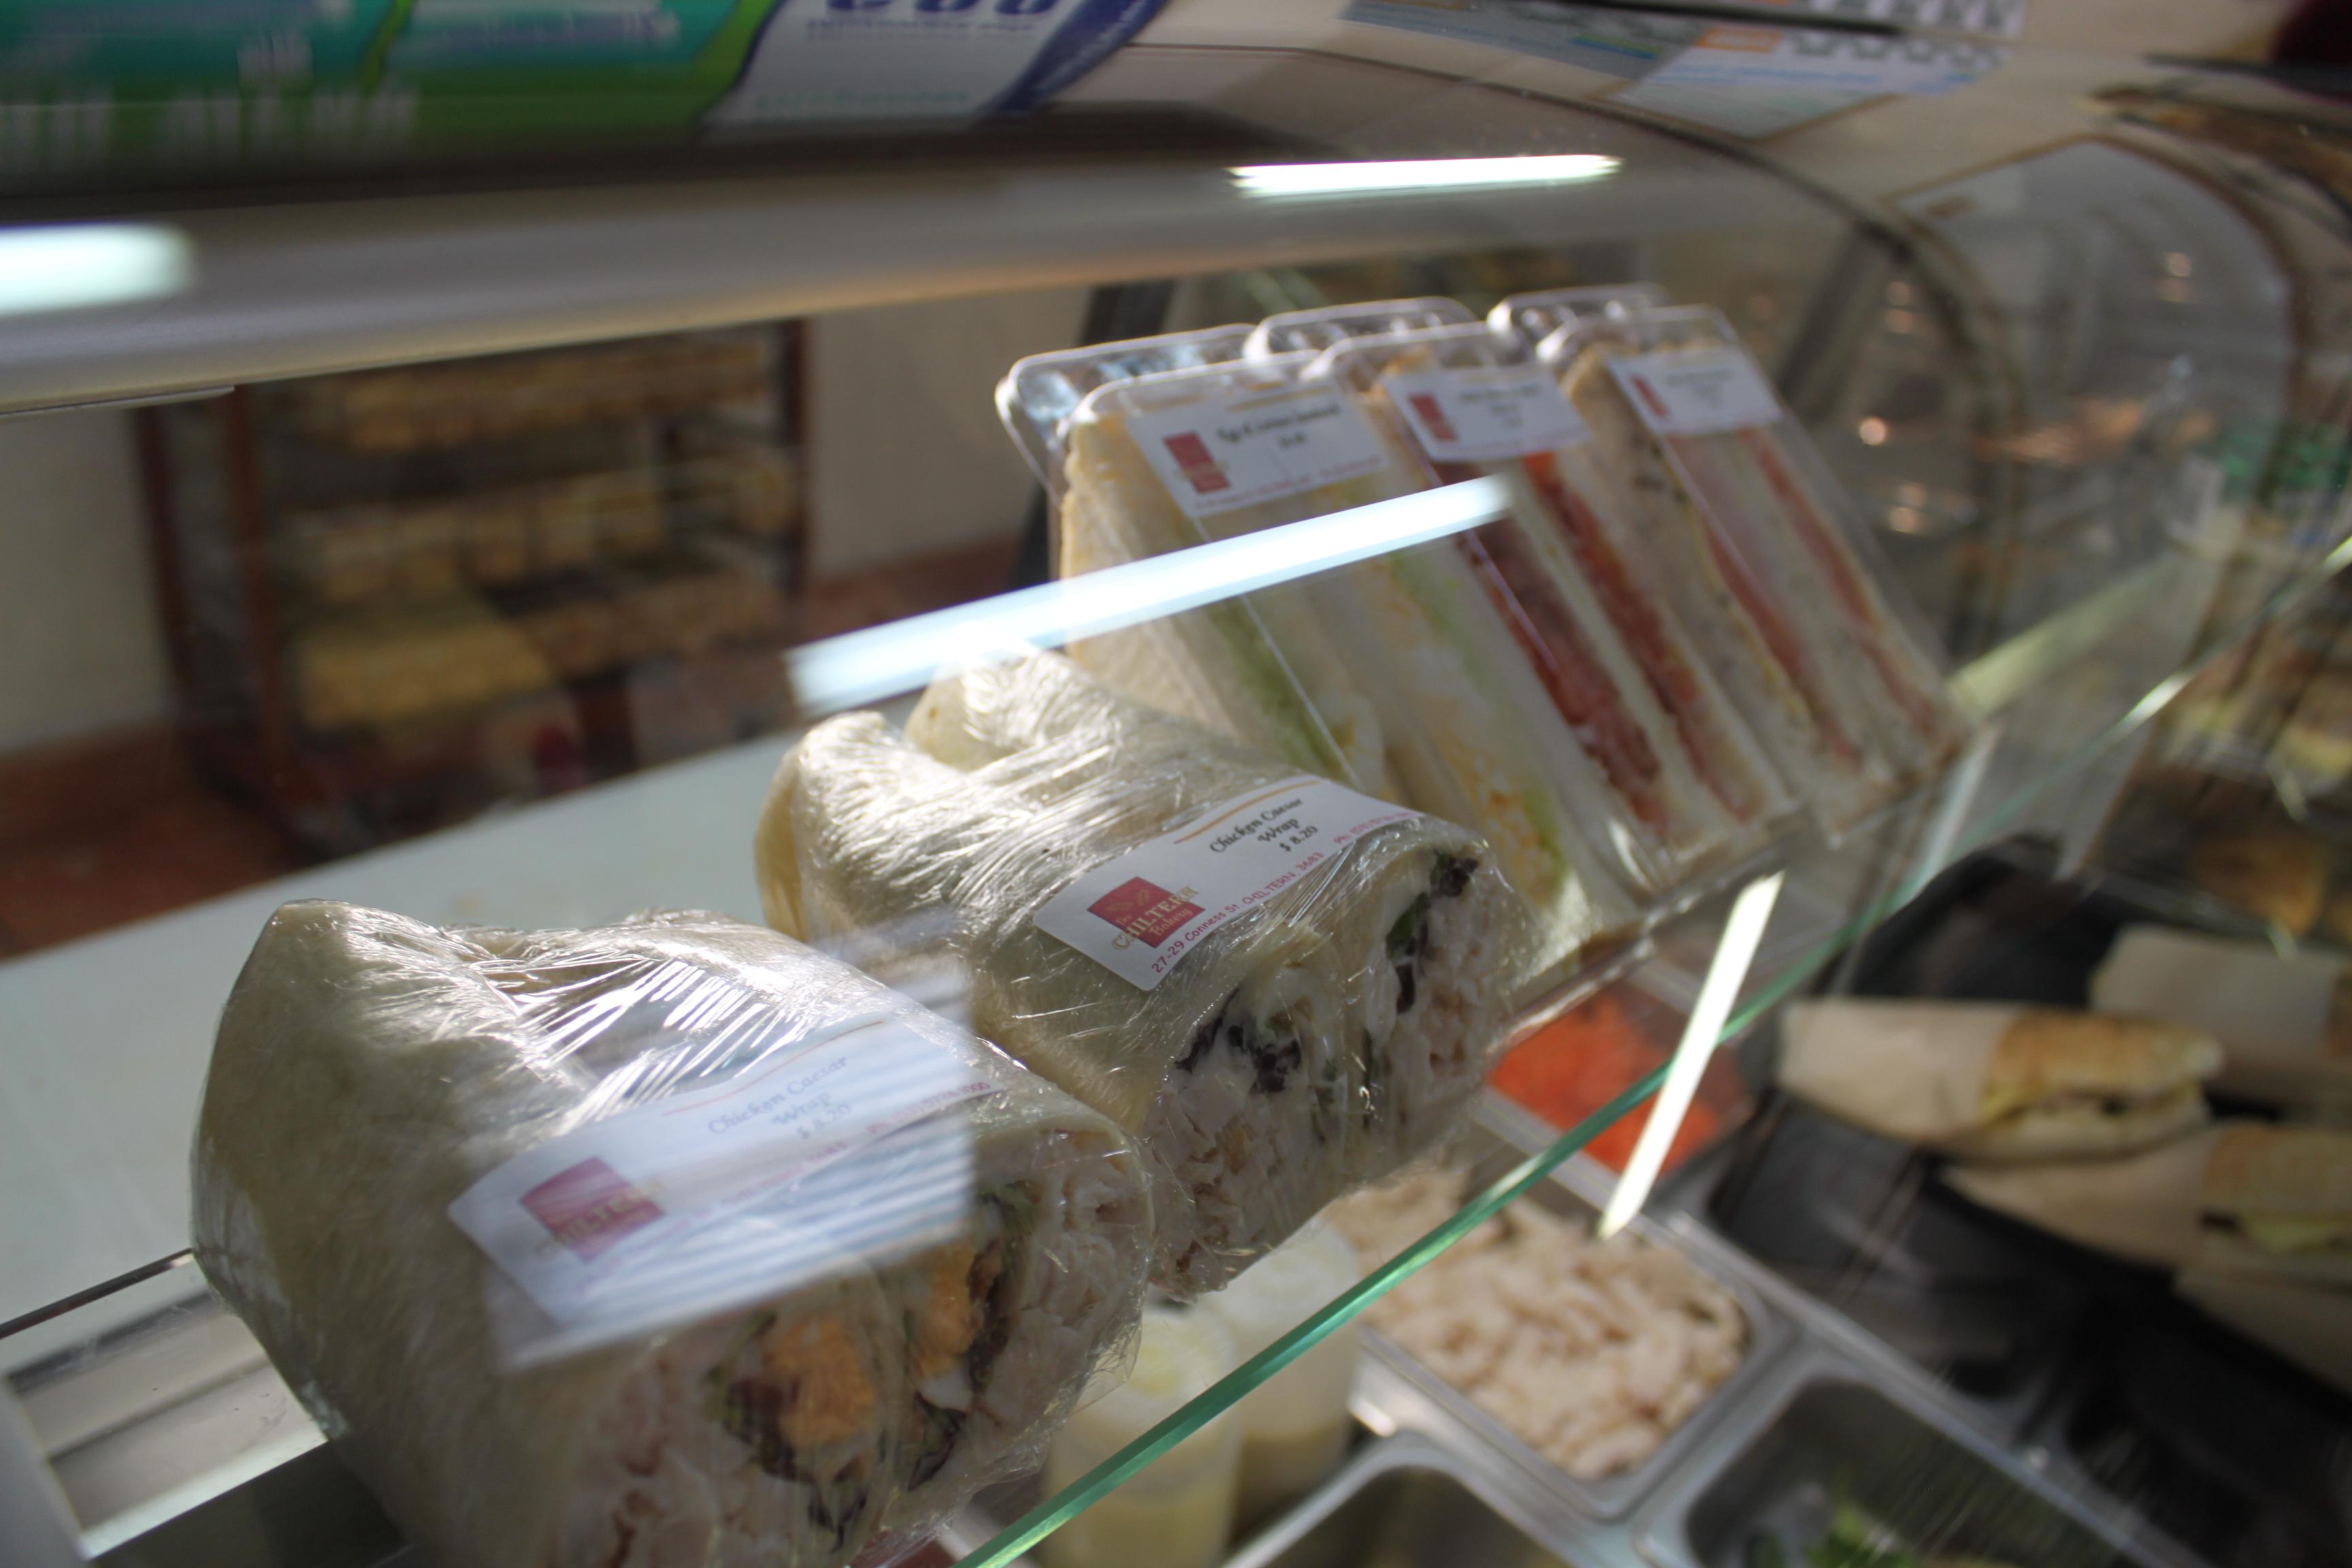 Range of Sandwiches, Rolls & Wraps